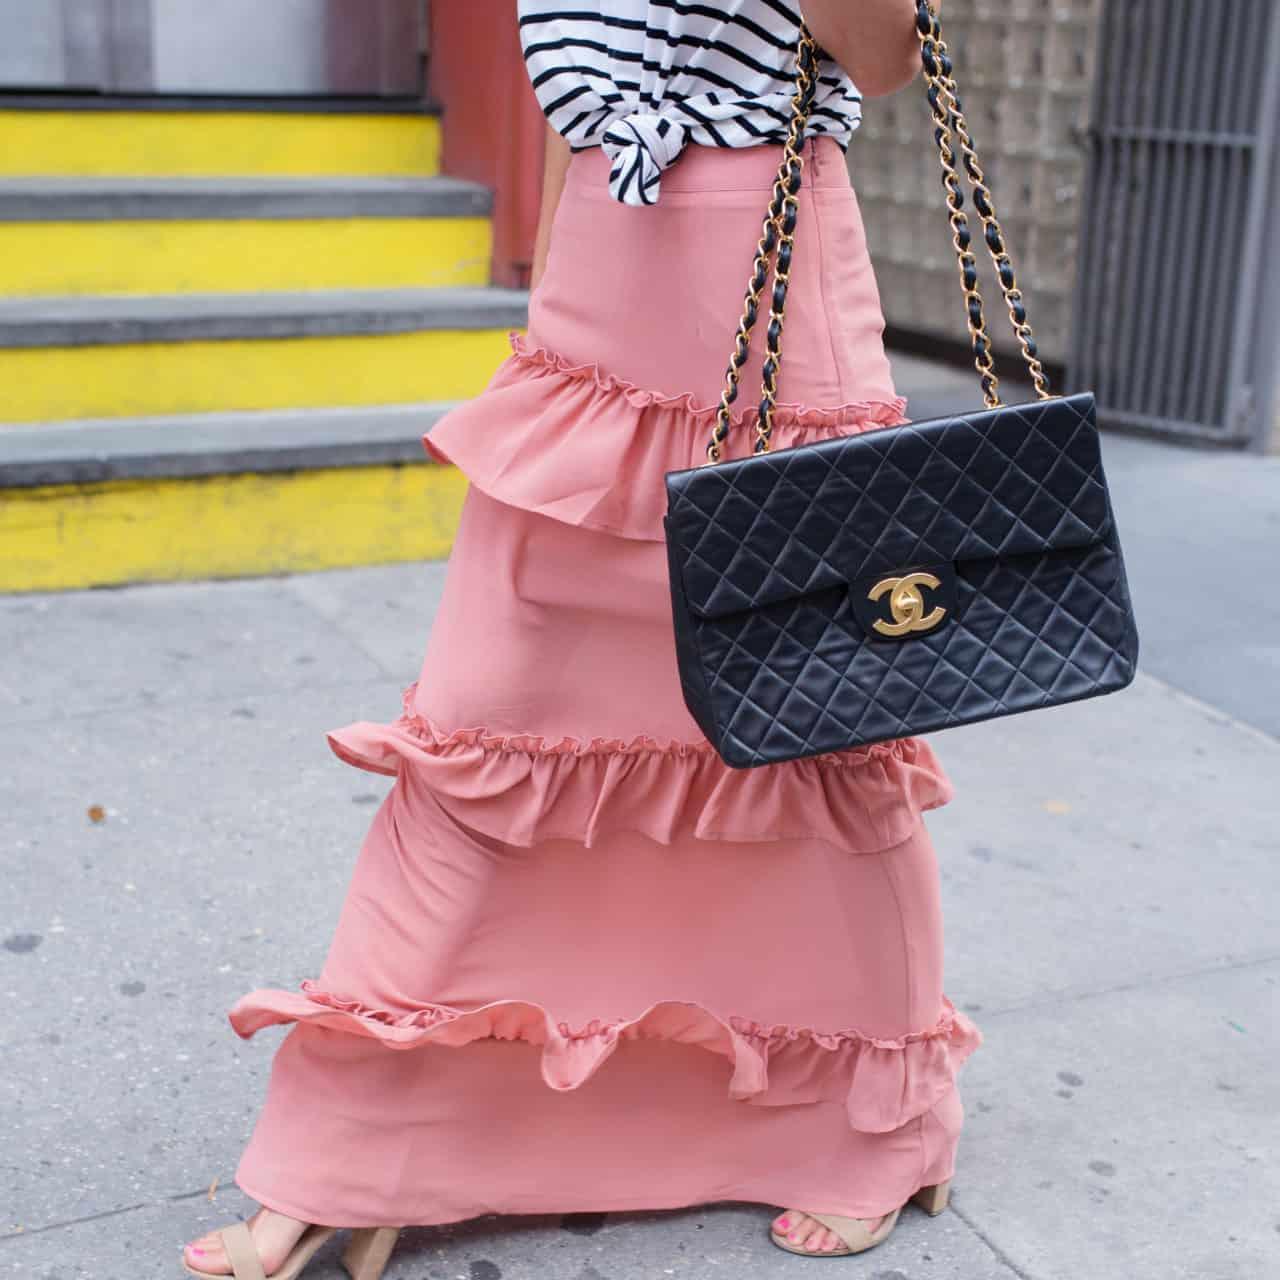 NYFW – Ruffle Skirt + Striped Tee